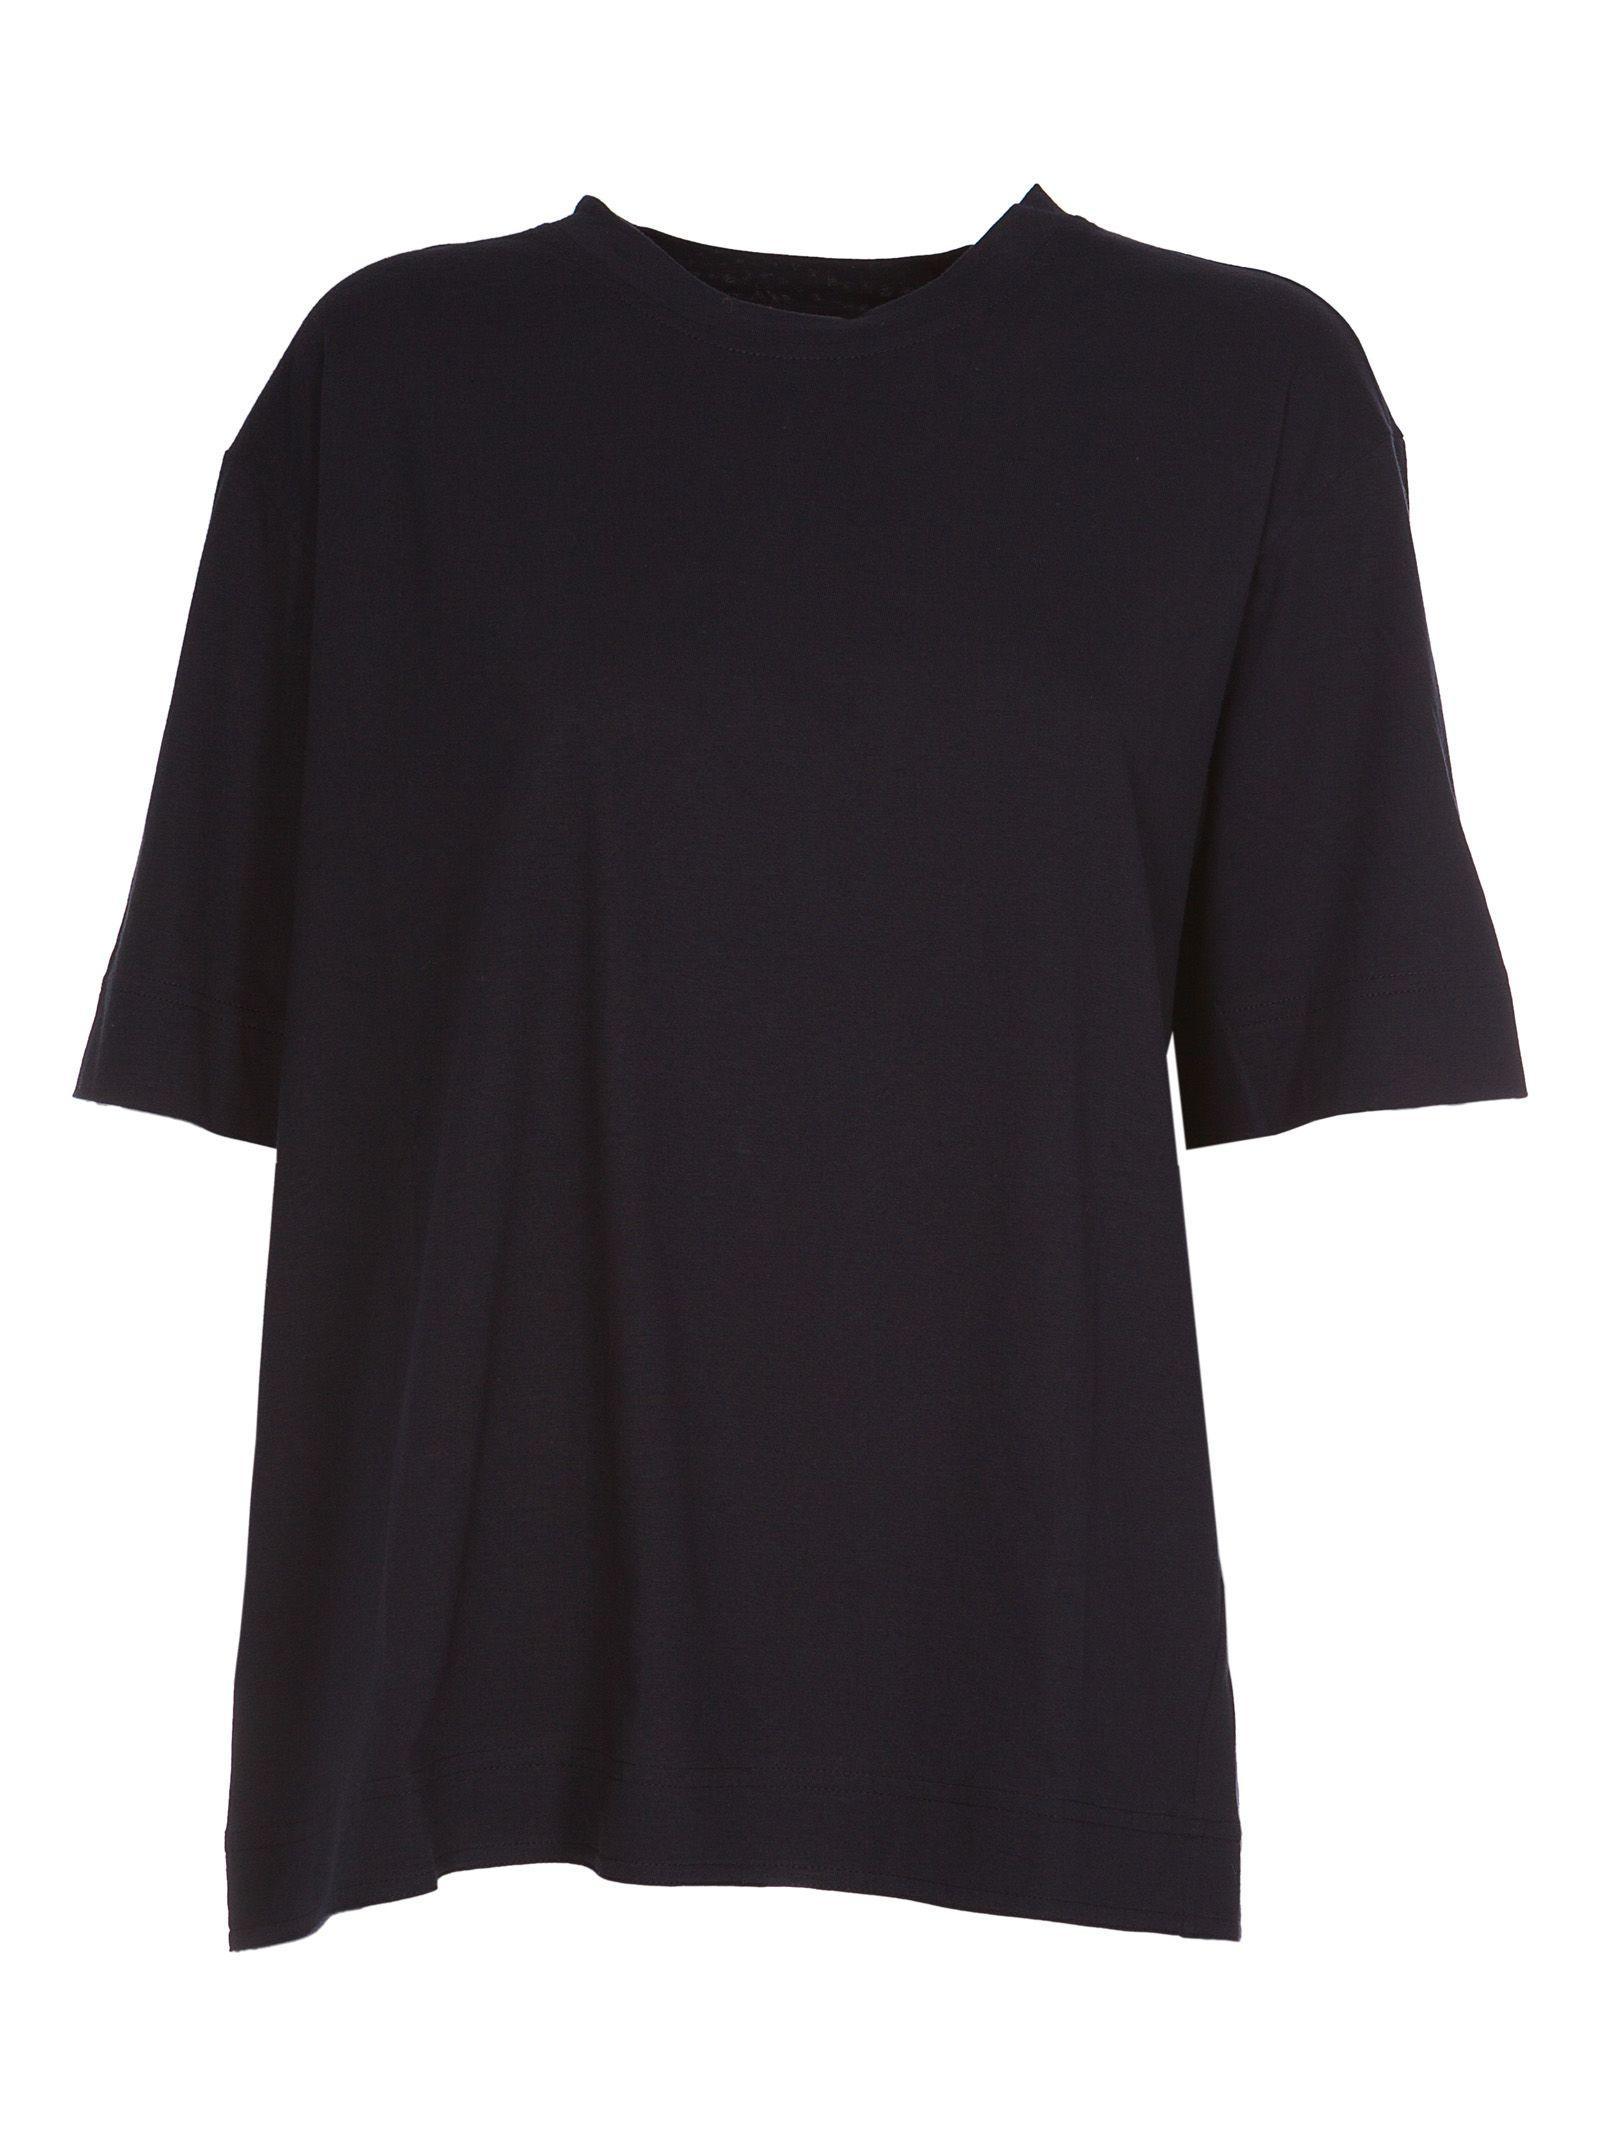 Marni Classic T-shirt In Y0077